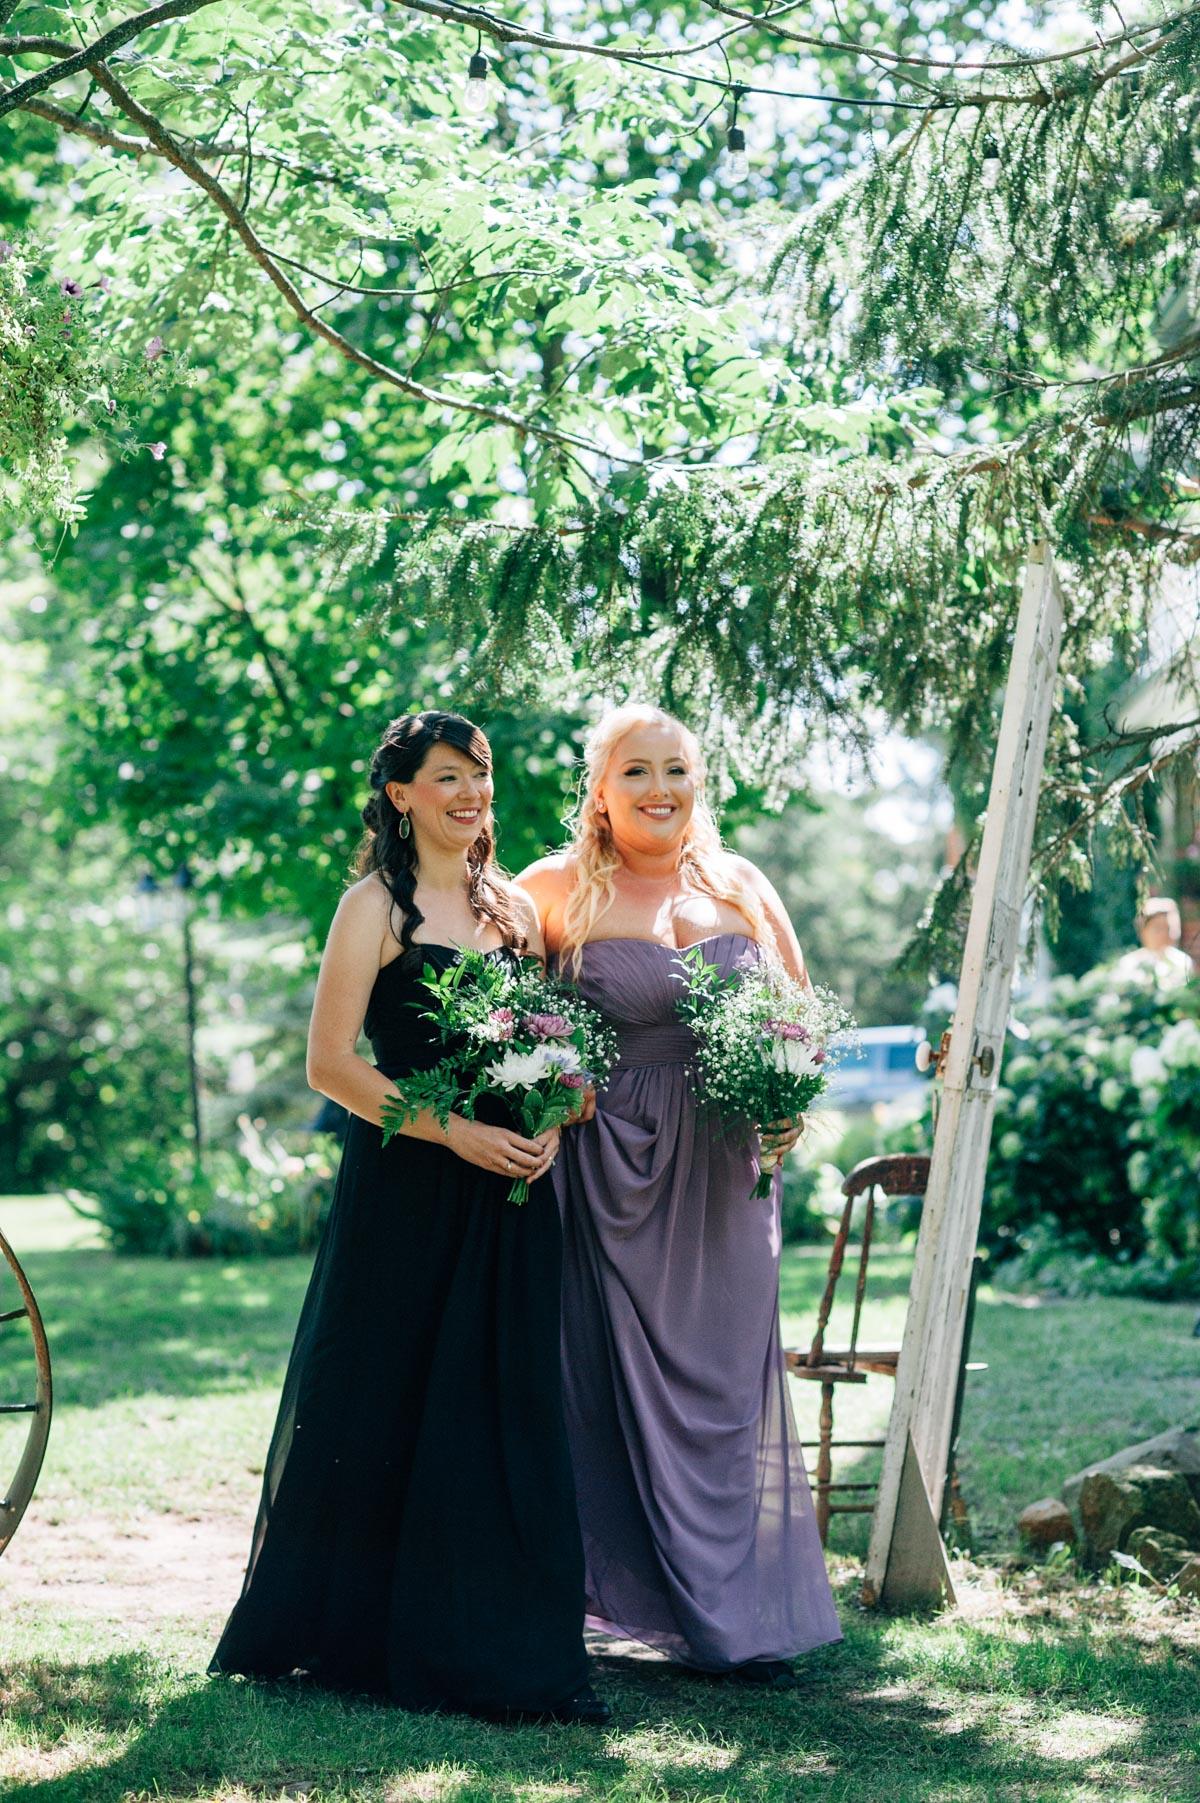 sara-wilde-photography-vineyard-bride-swish-list-beamer-falls-manor-grimsby-wedding-21.jpg